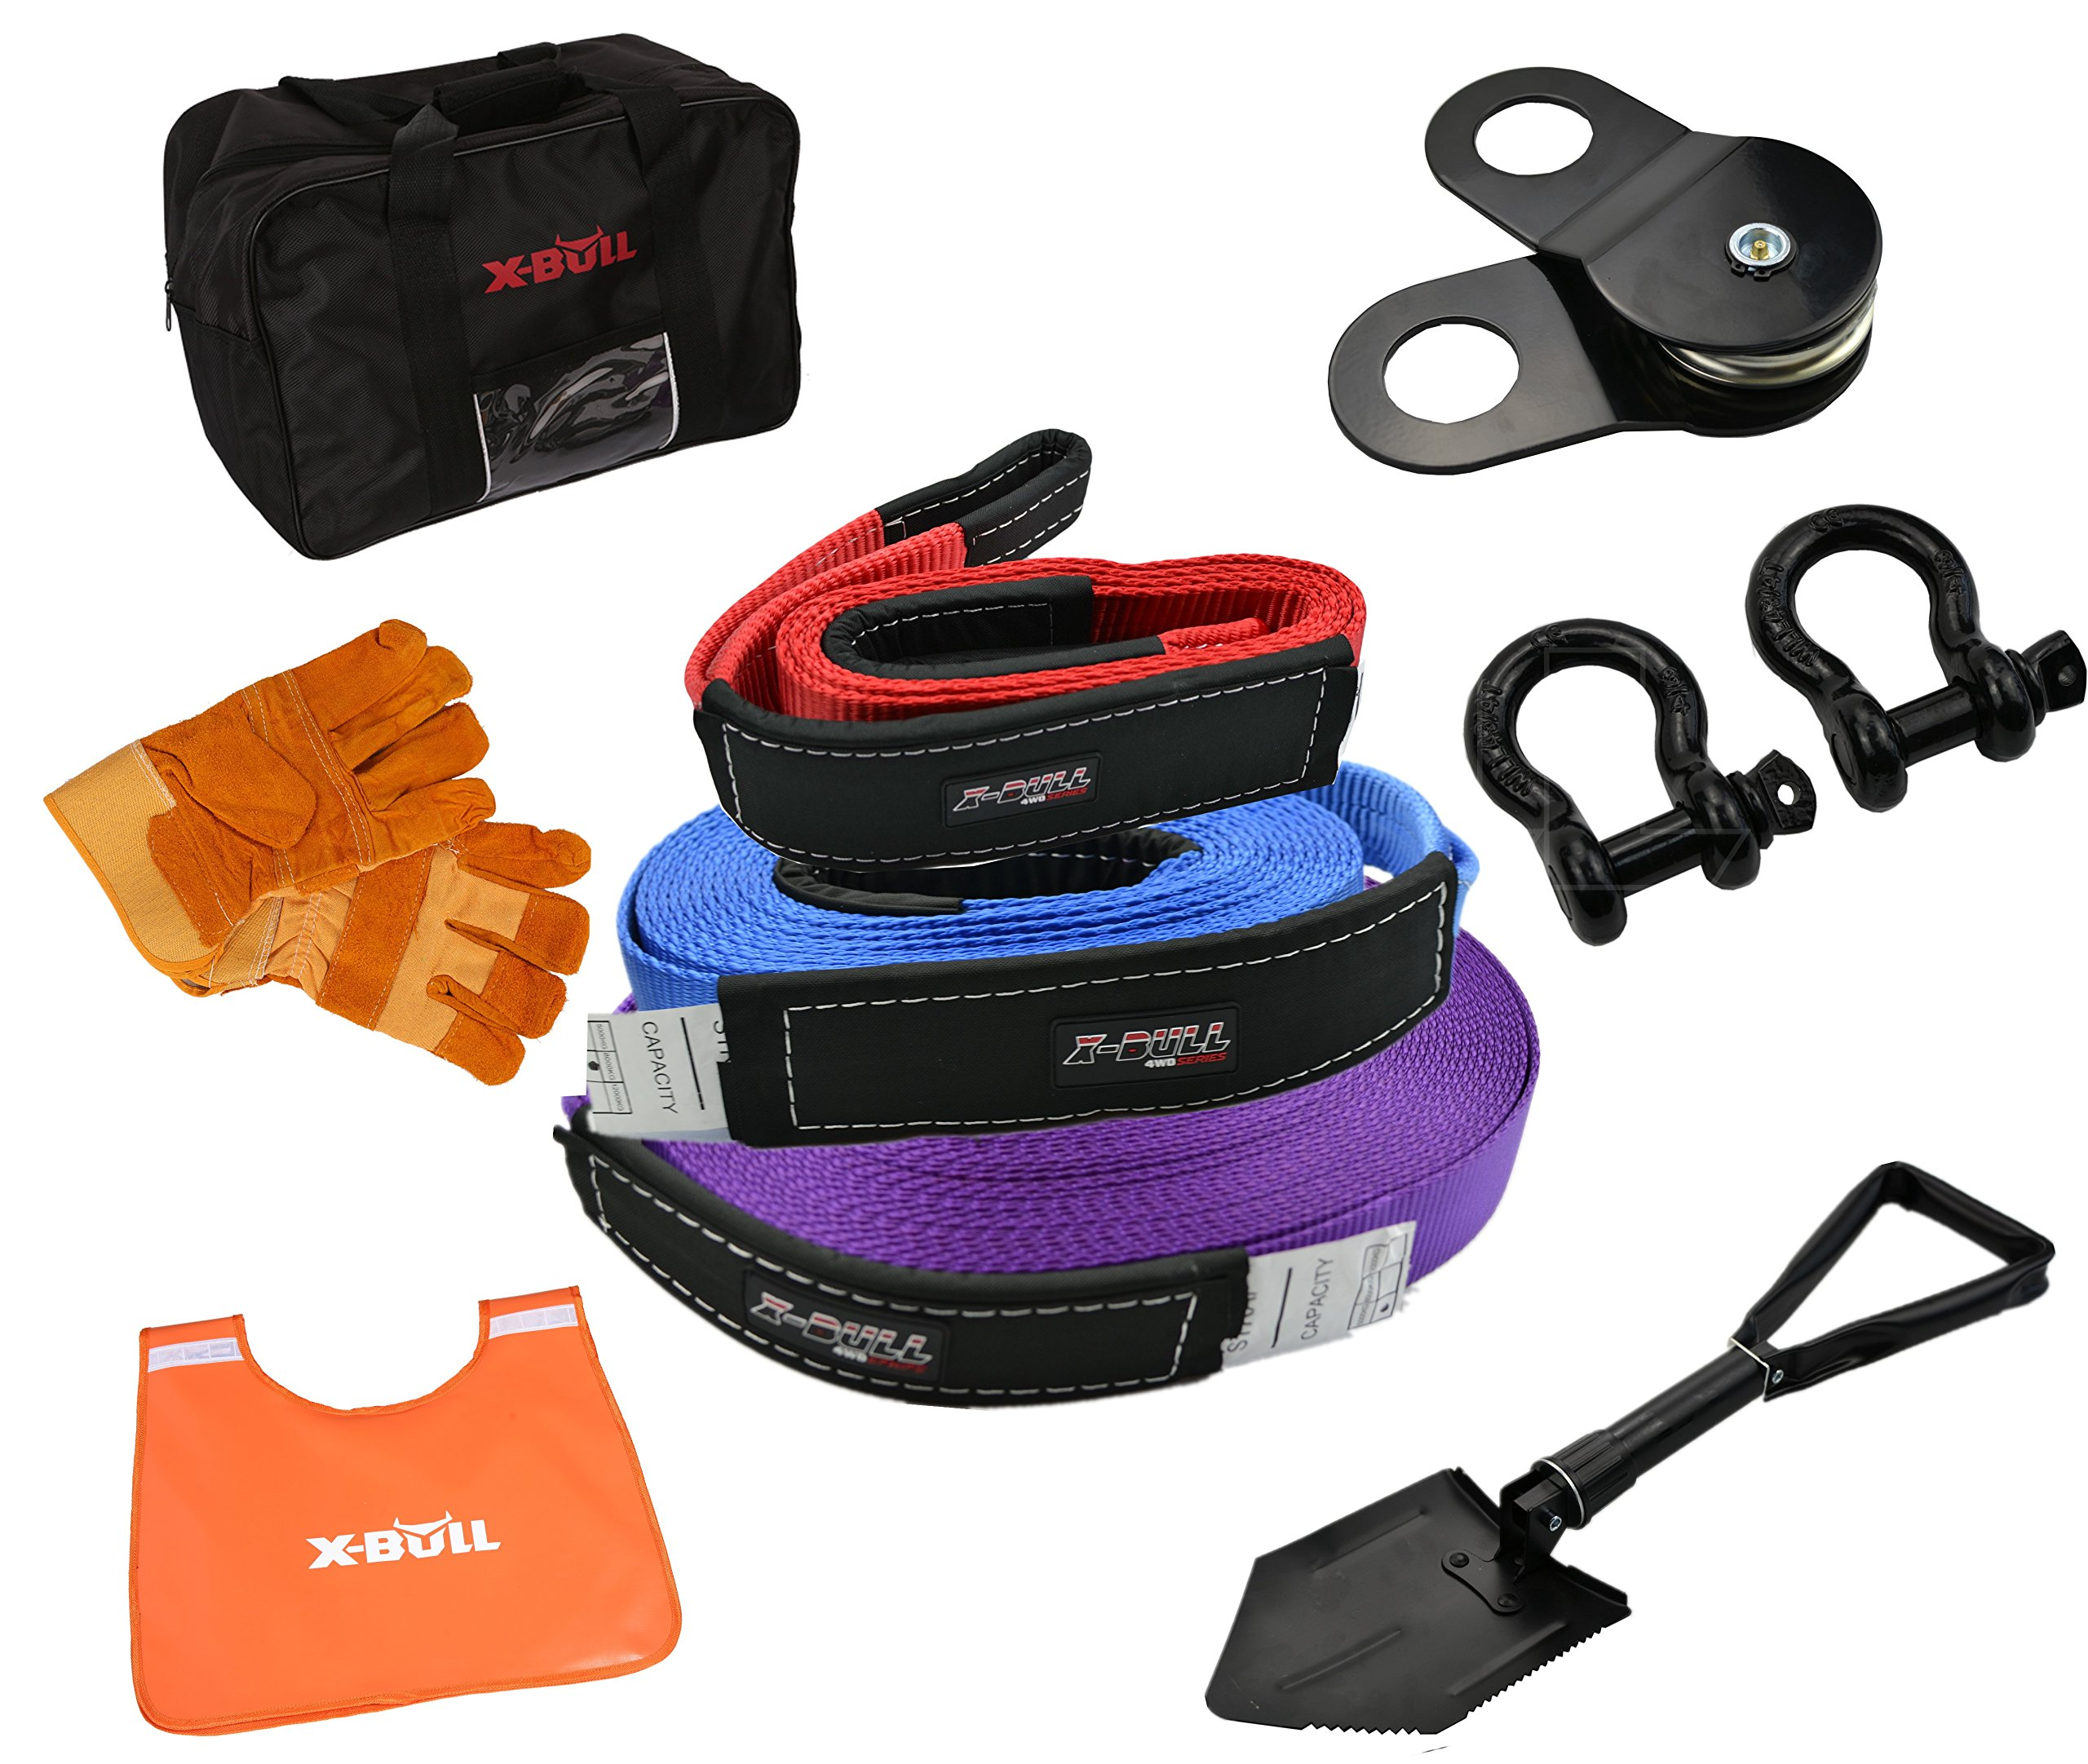 X-BULL Recovery Winch Kit Rigging kit (11PCS) by X-BULL